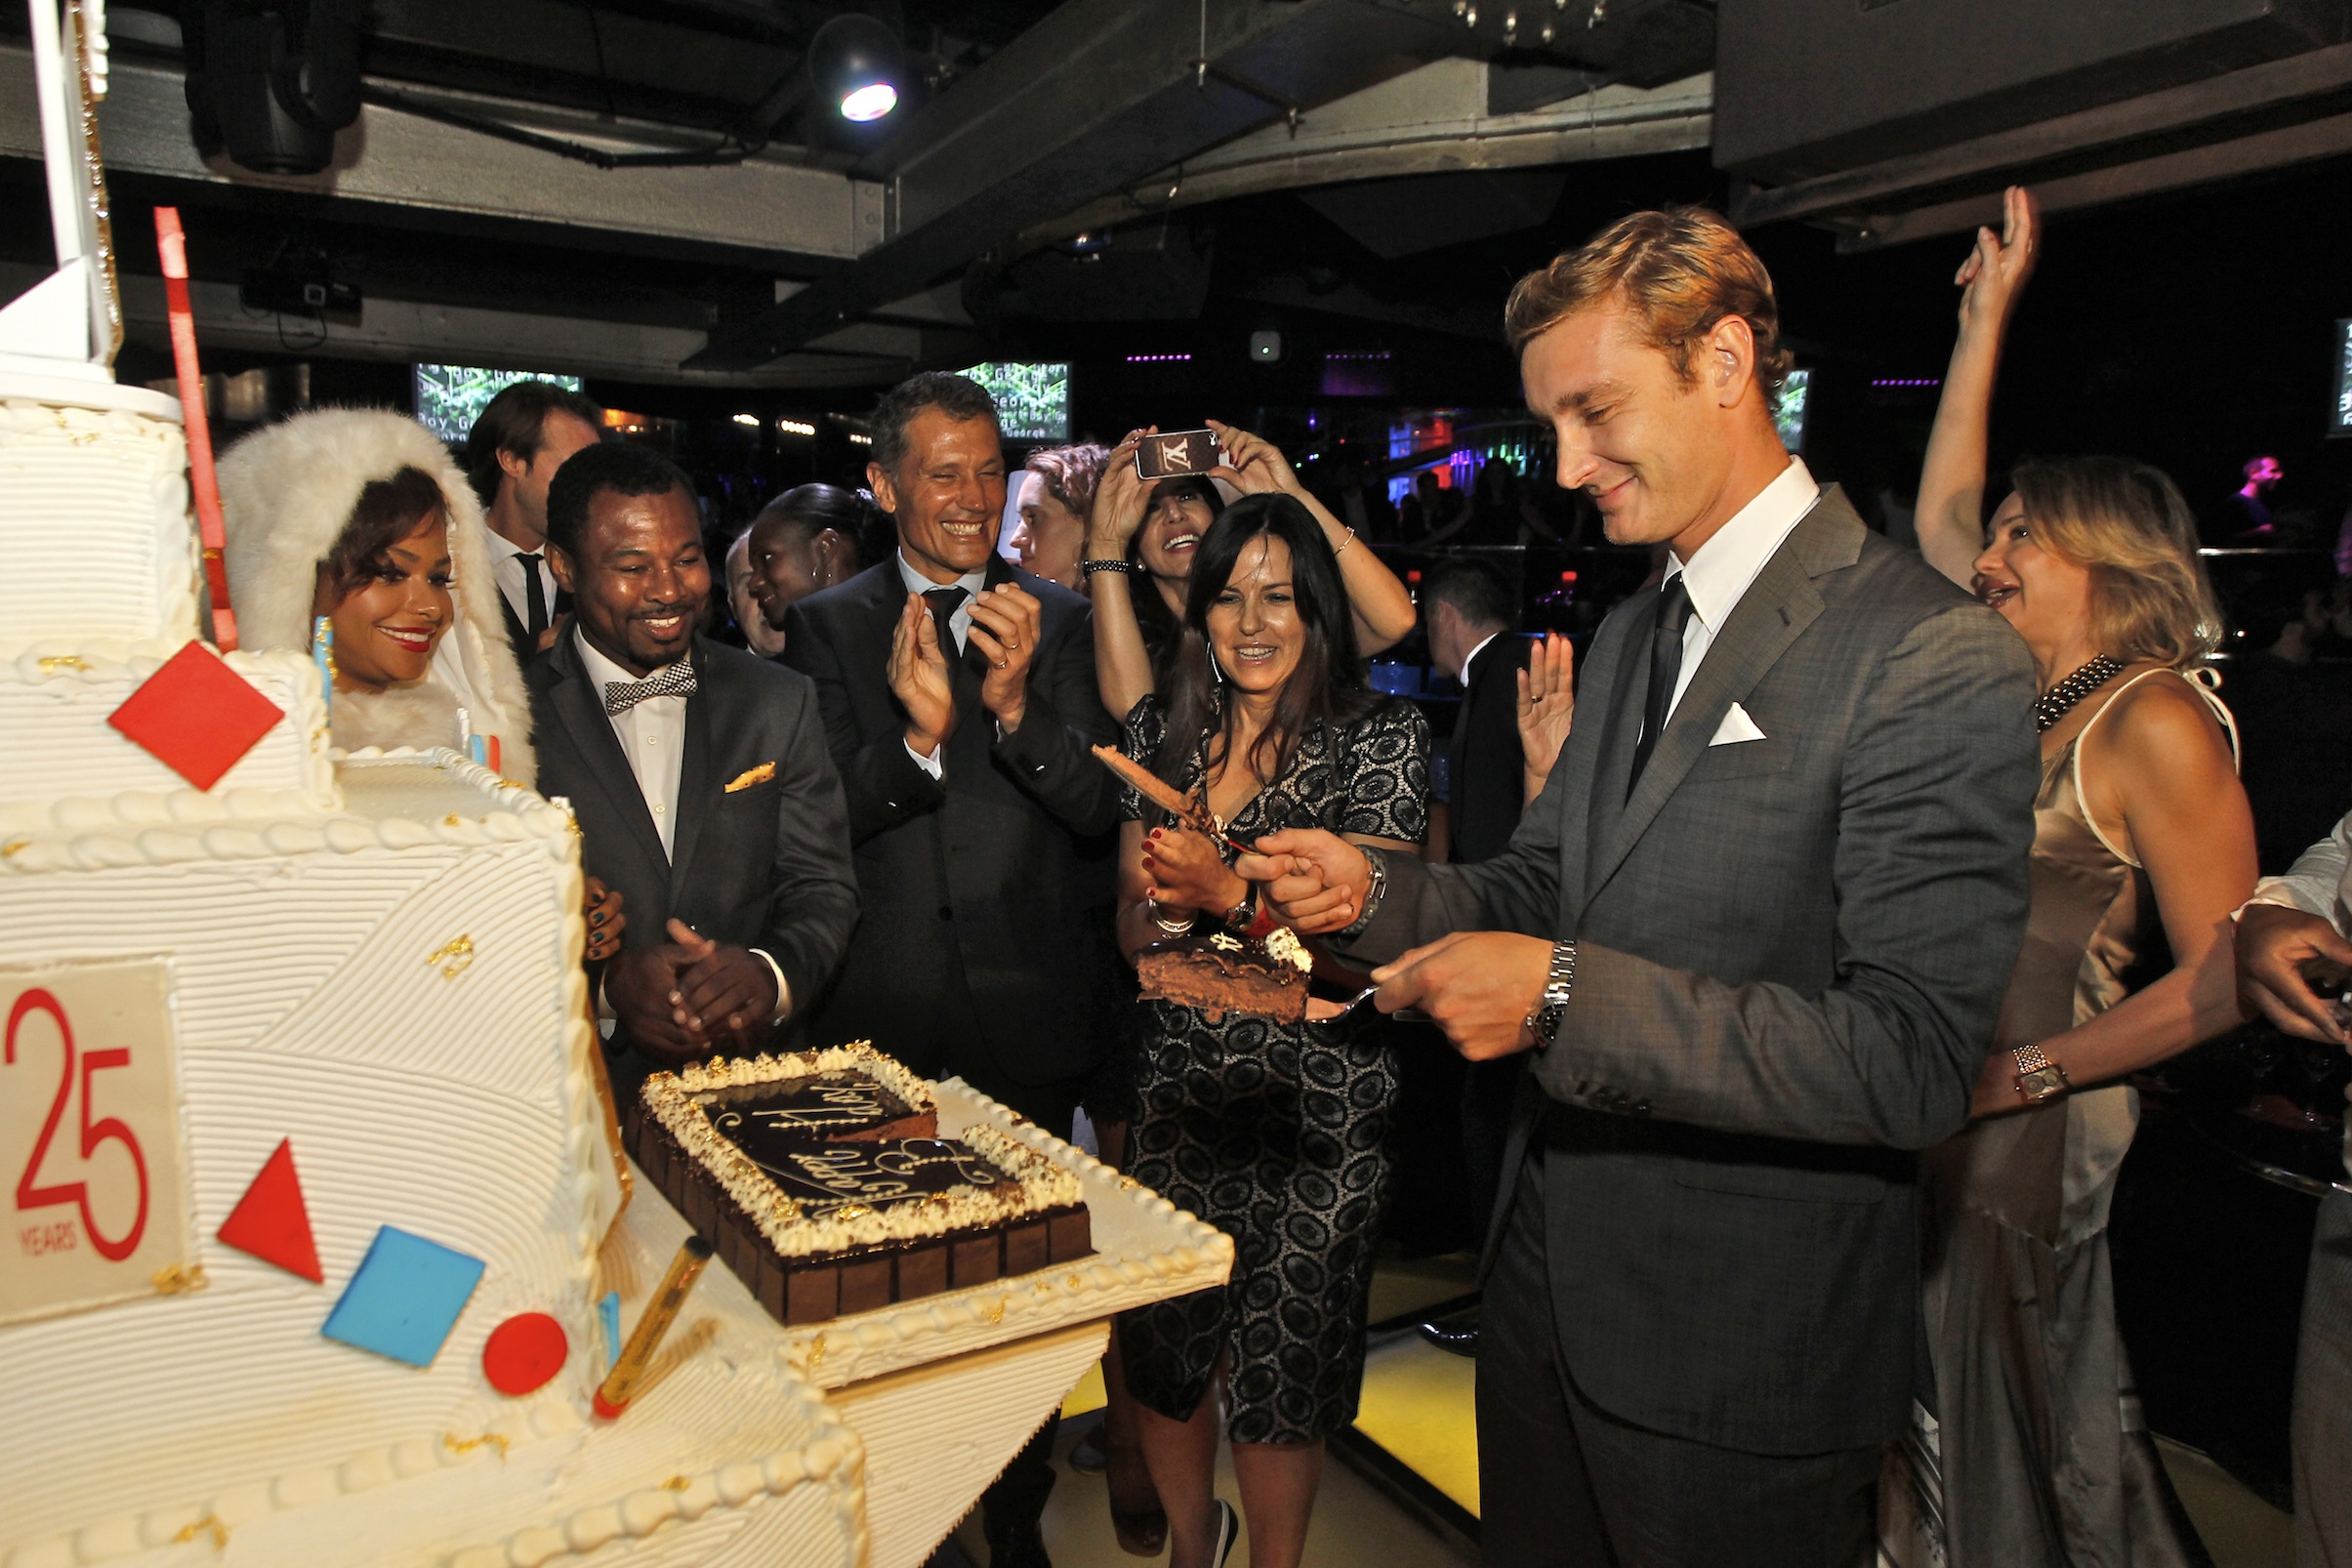 pierre-casiraghi-cutting-the-25th-year-anniversary-cake-sportel-25-years1.jpg